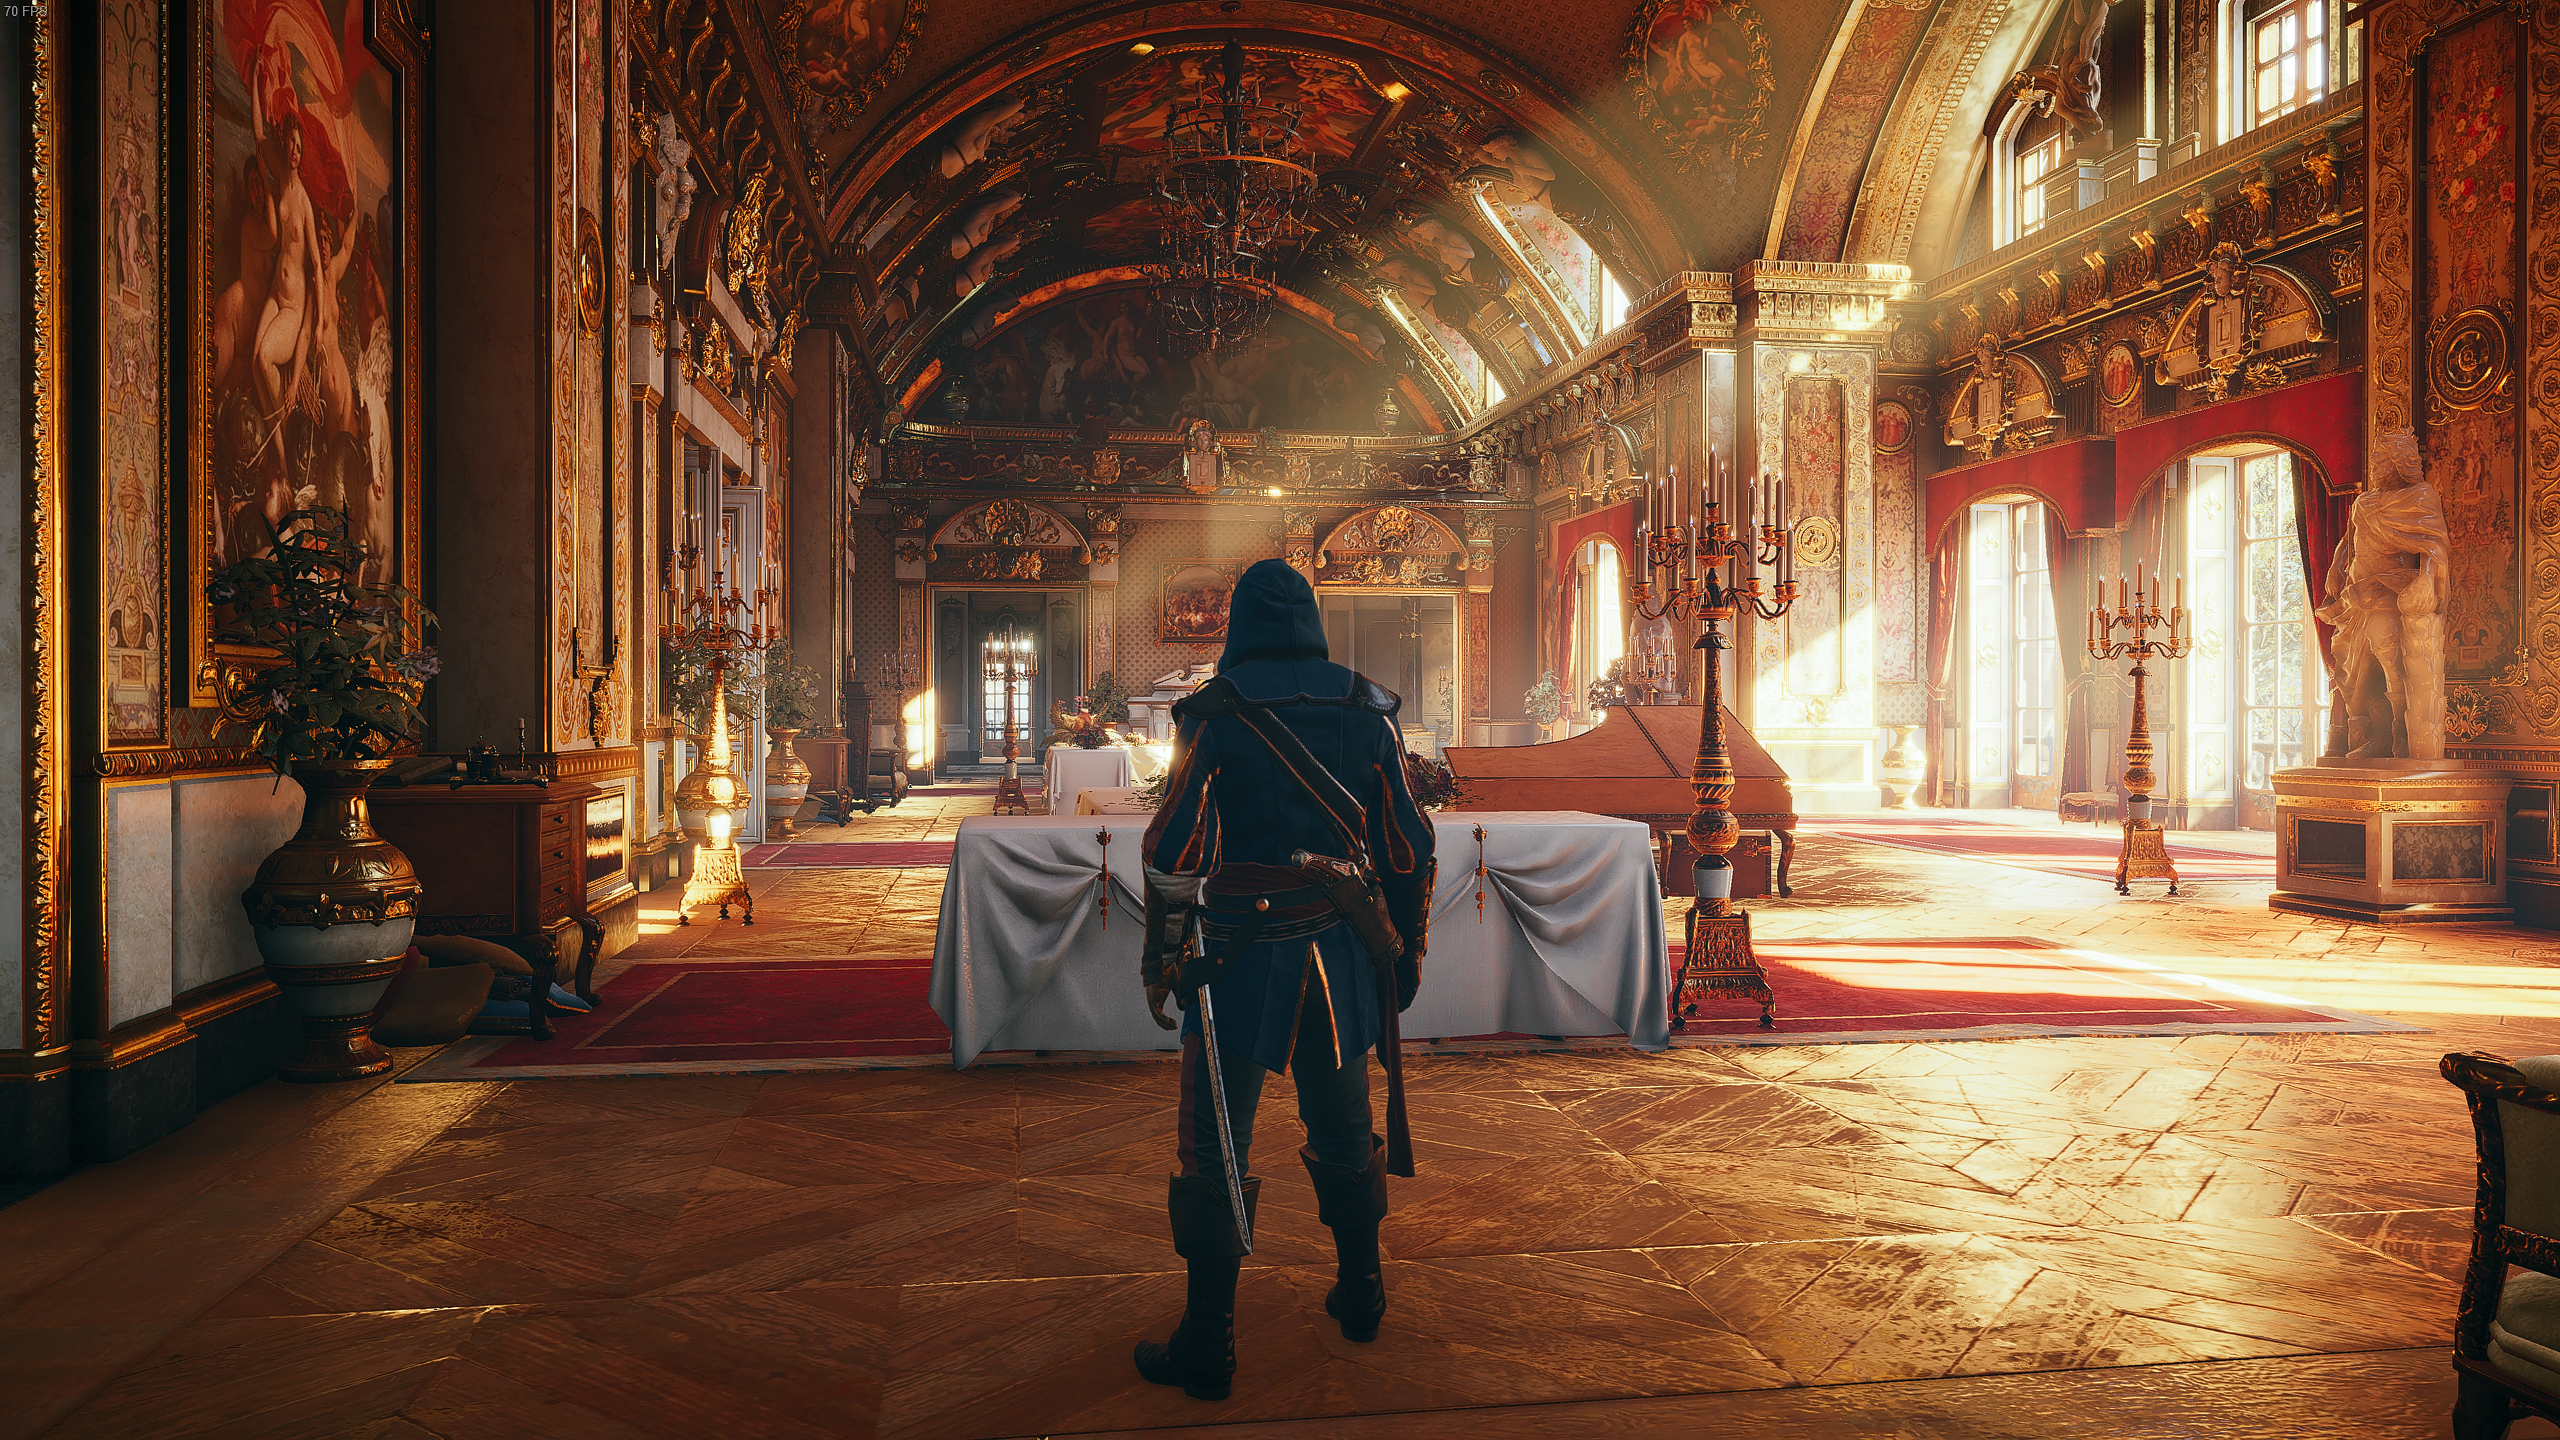 Assassin's Creed  Unity Super-Resolution 2021.01.08 - 21.35.41.91 — копия.png - Assassin's Creed: Unity